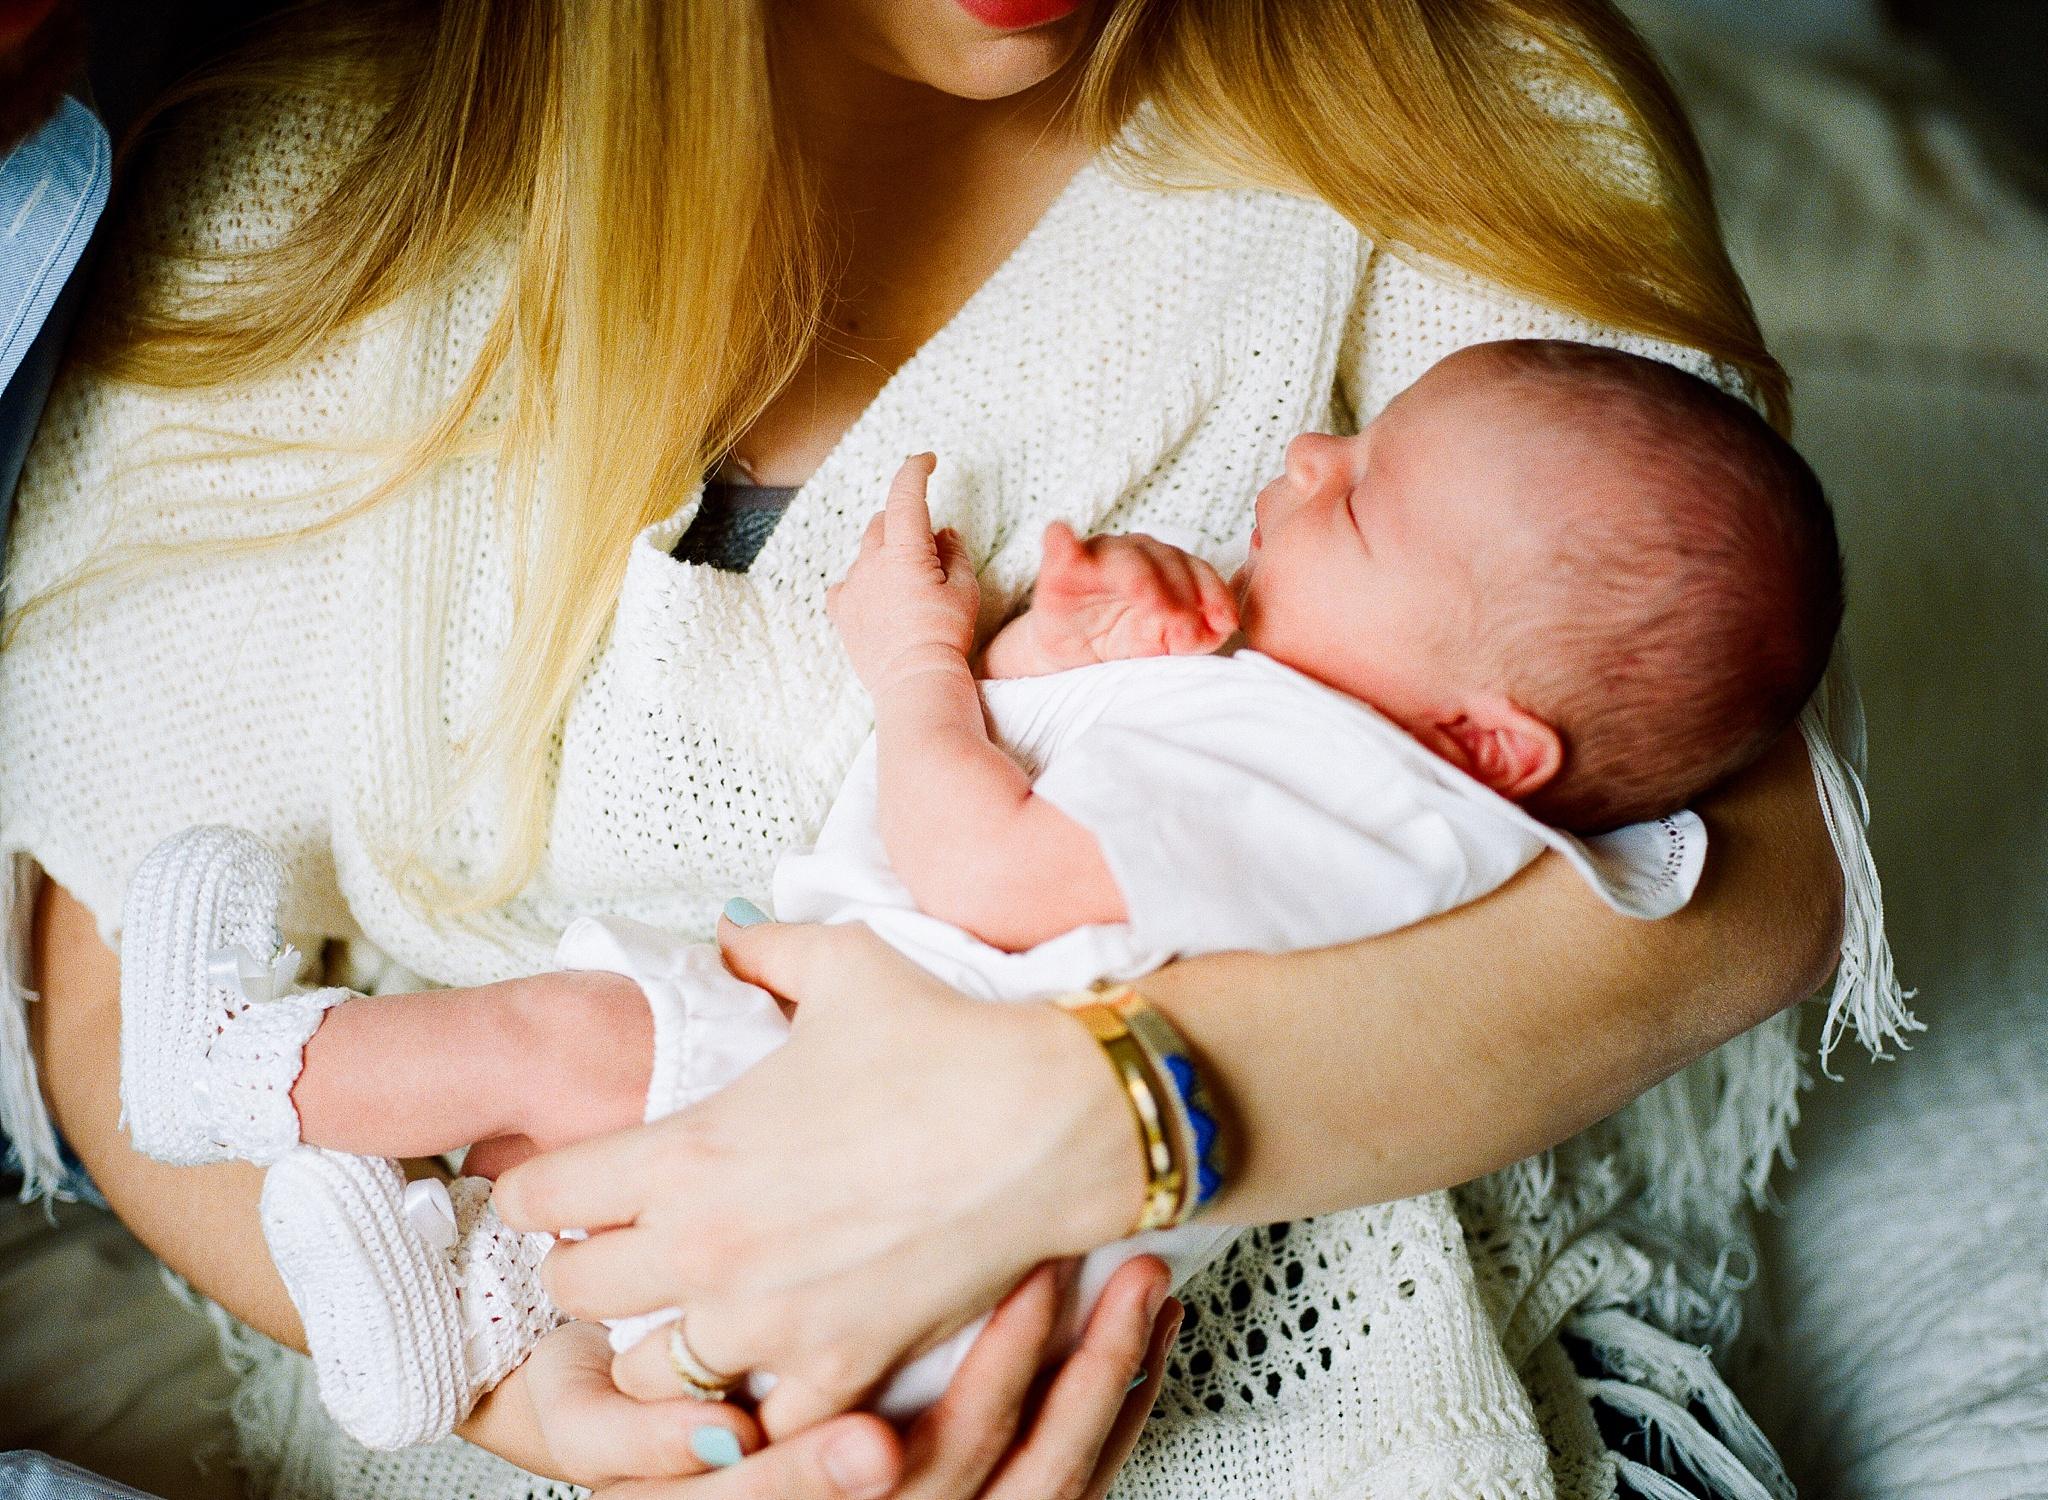 atlanta-georgia-fine-art-film-newborn-photographer-kaitlynne-grice-24.jpg